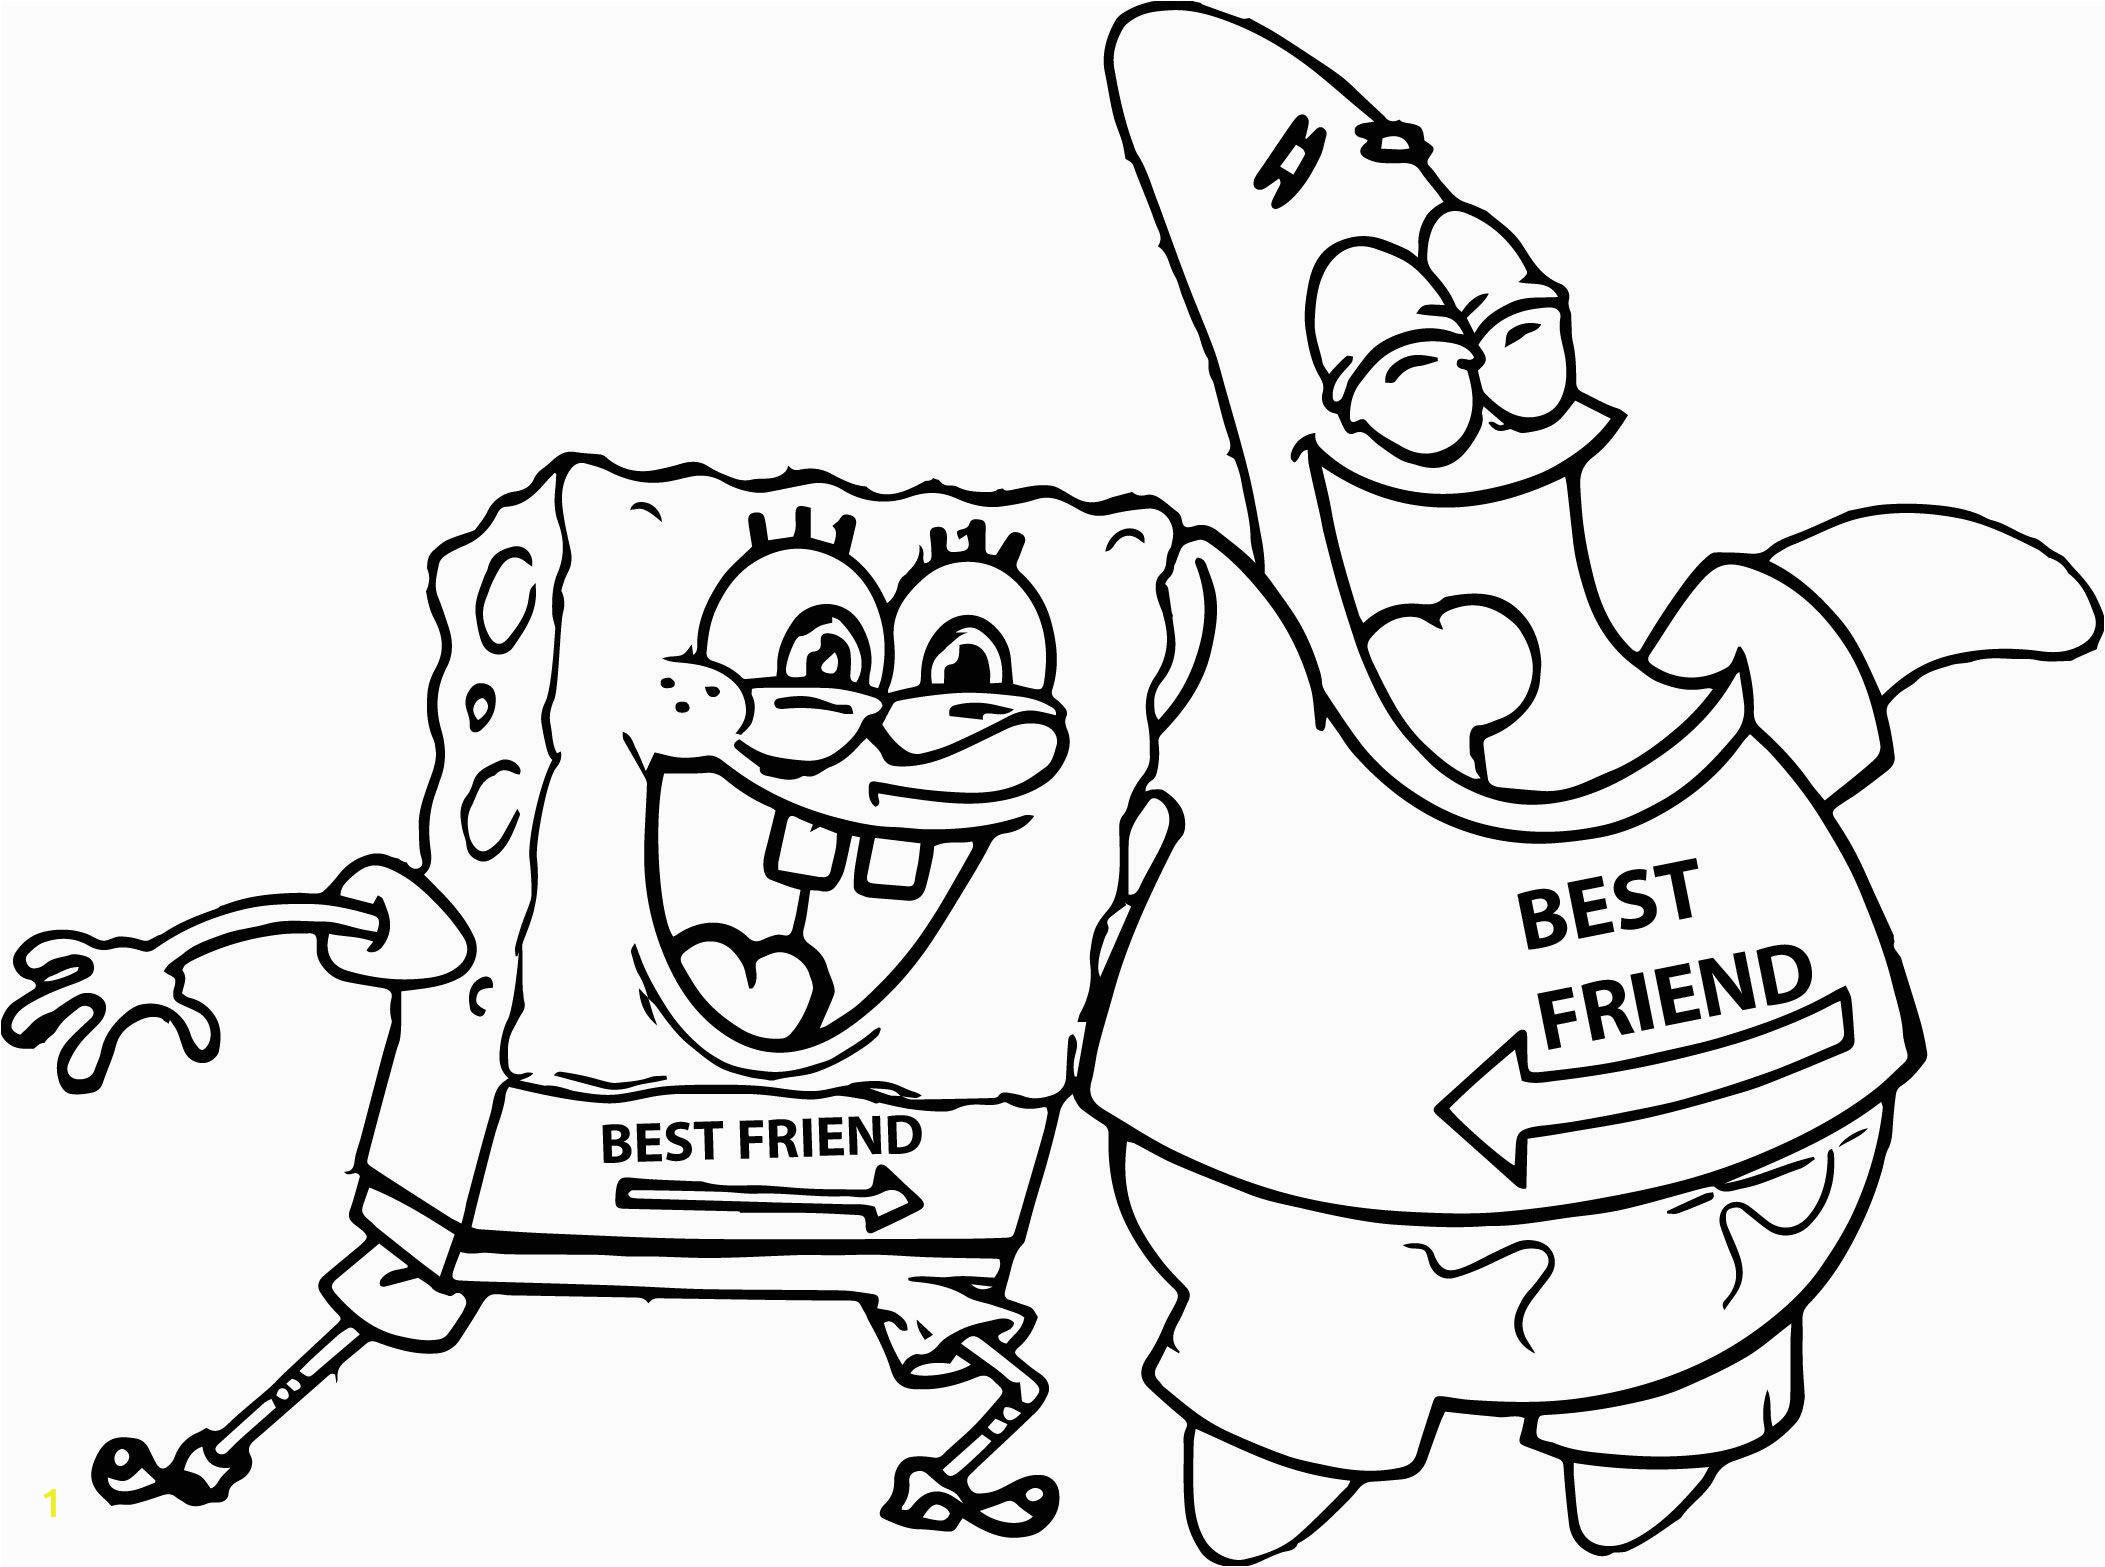 spongebobring books picture ideas book valuable sponge bobr page big squarepants online printable